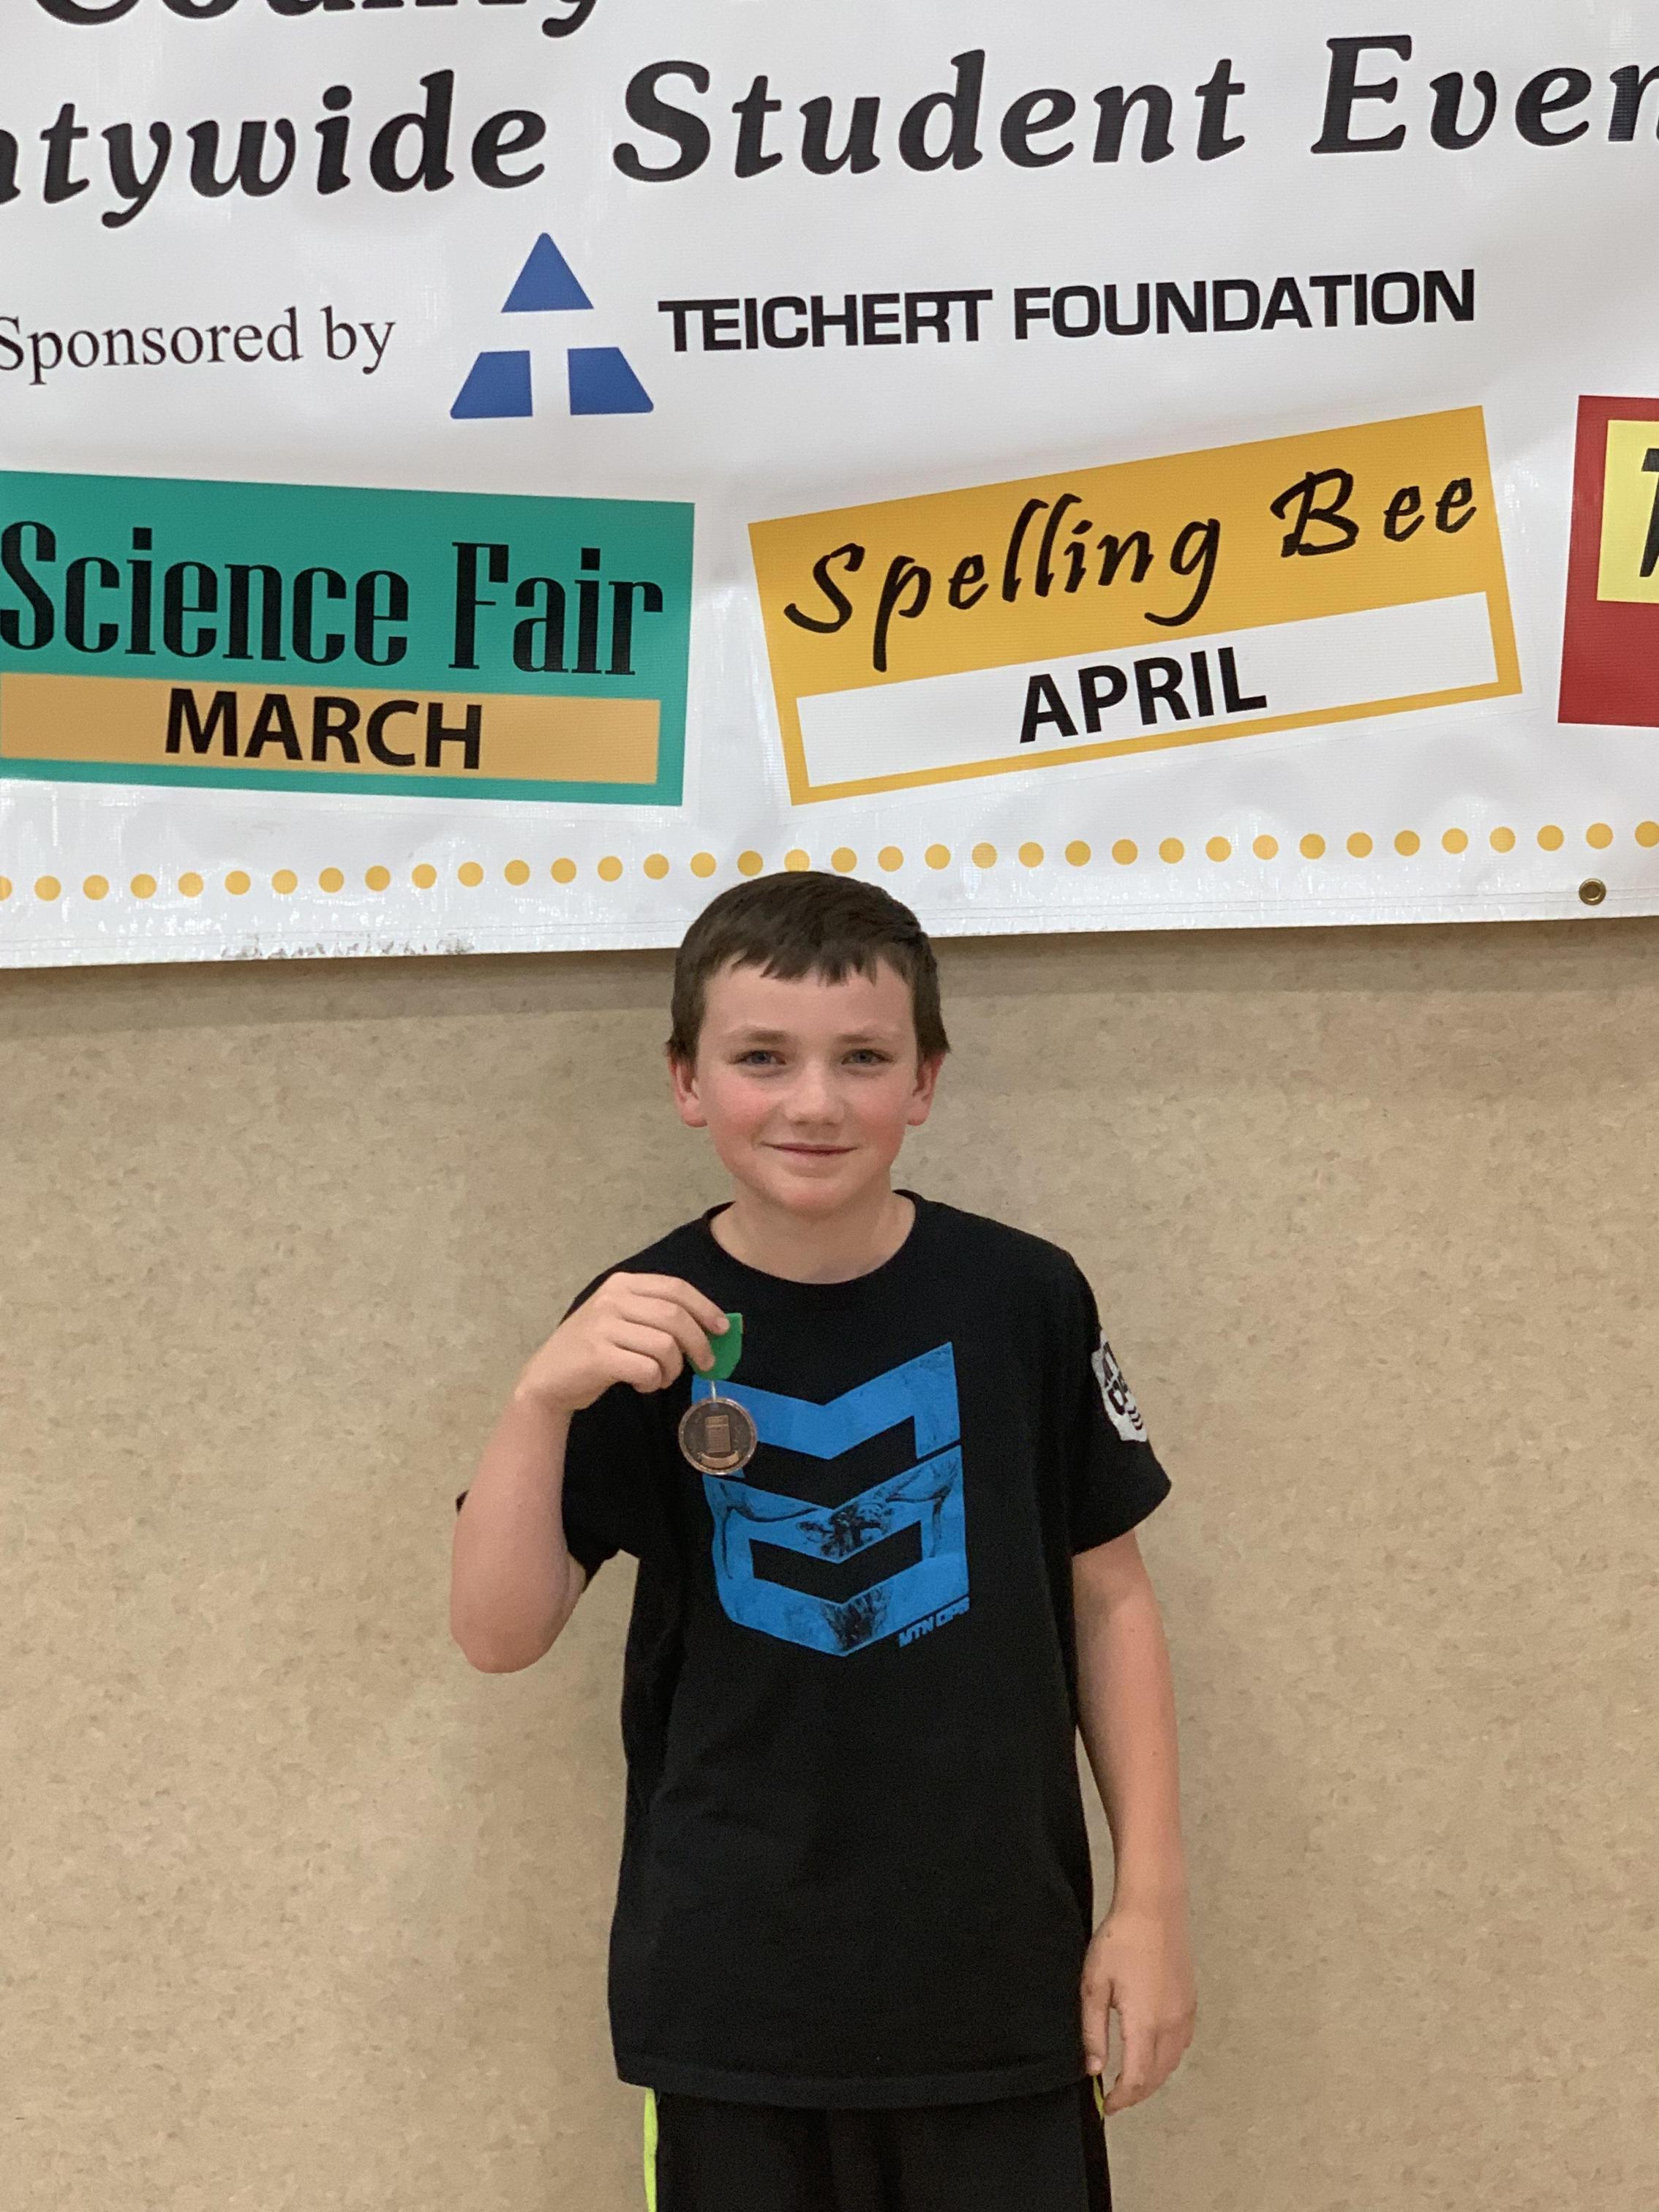 6th grade 5th place winner Blitz